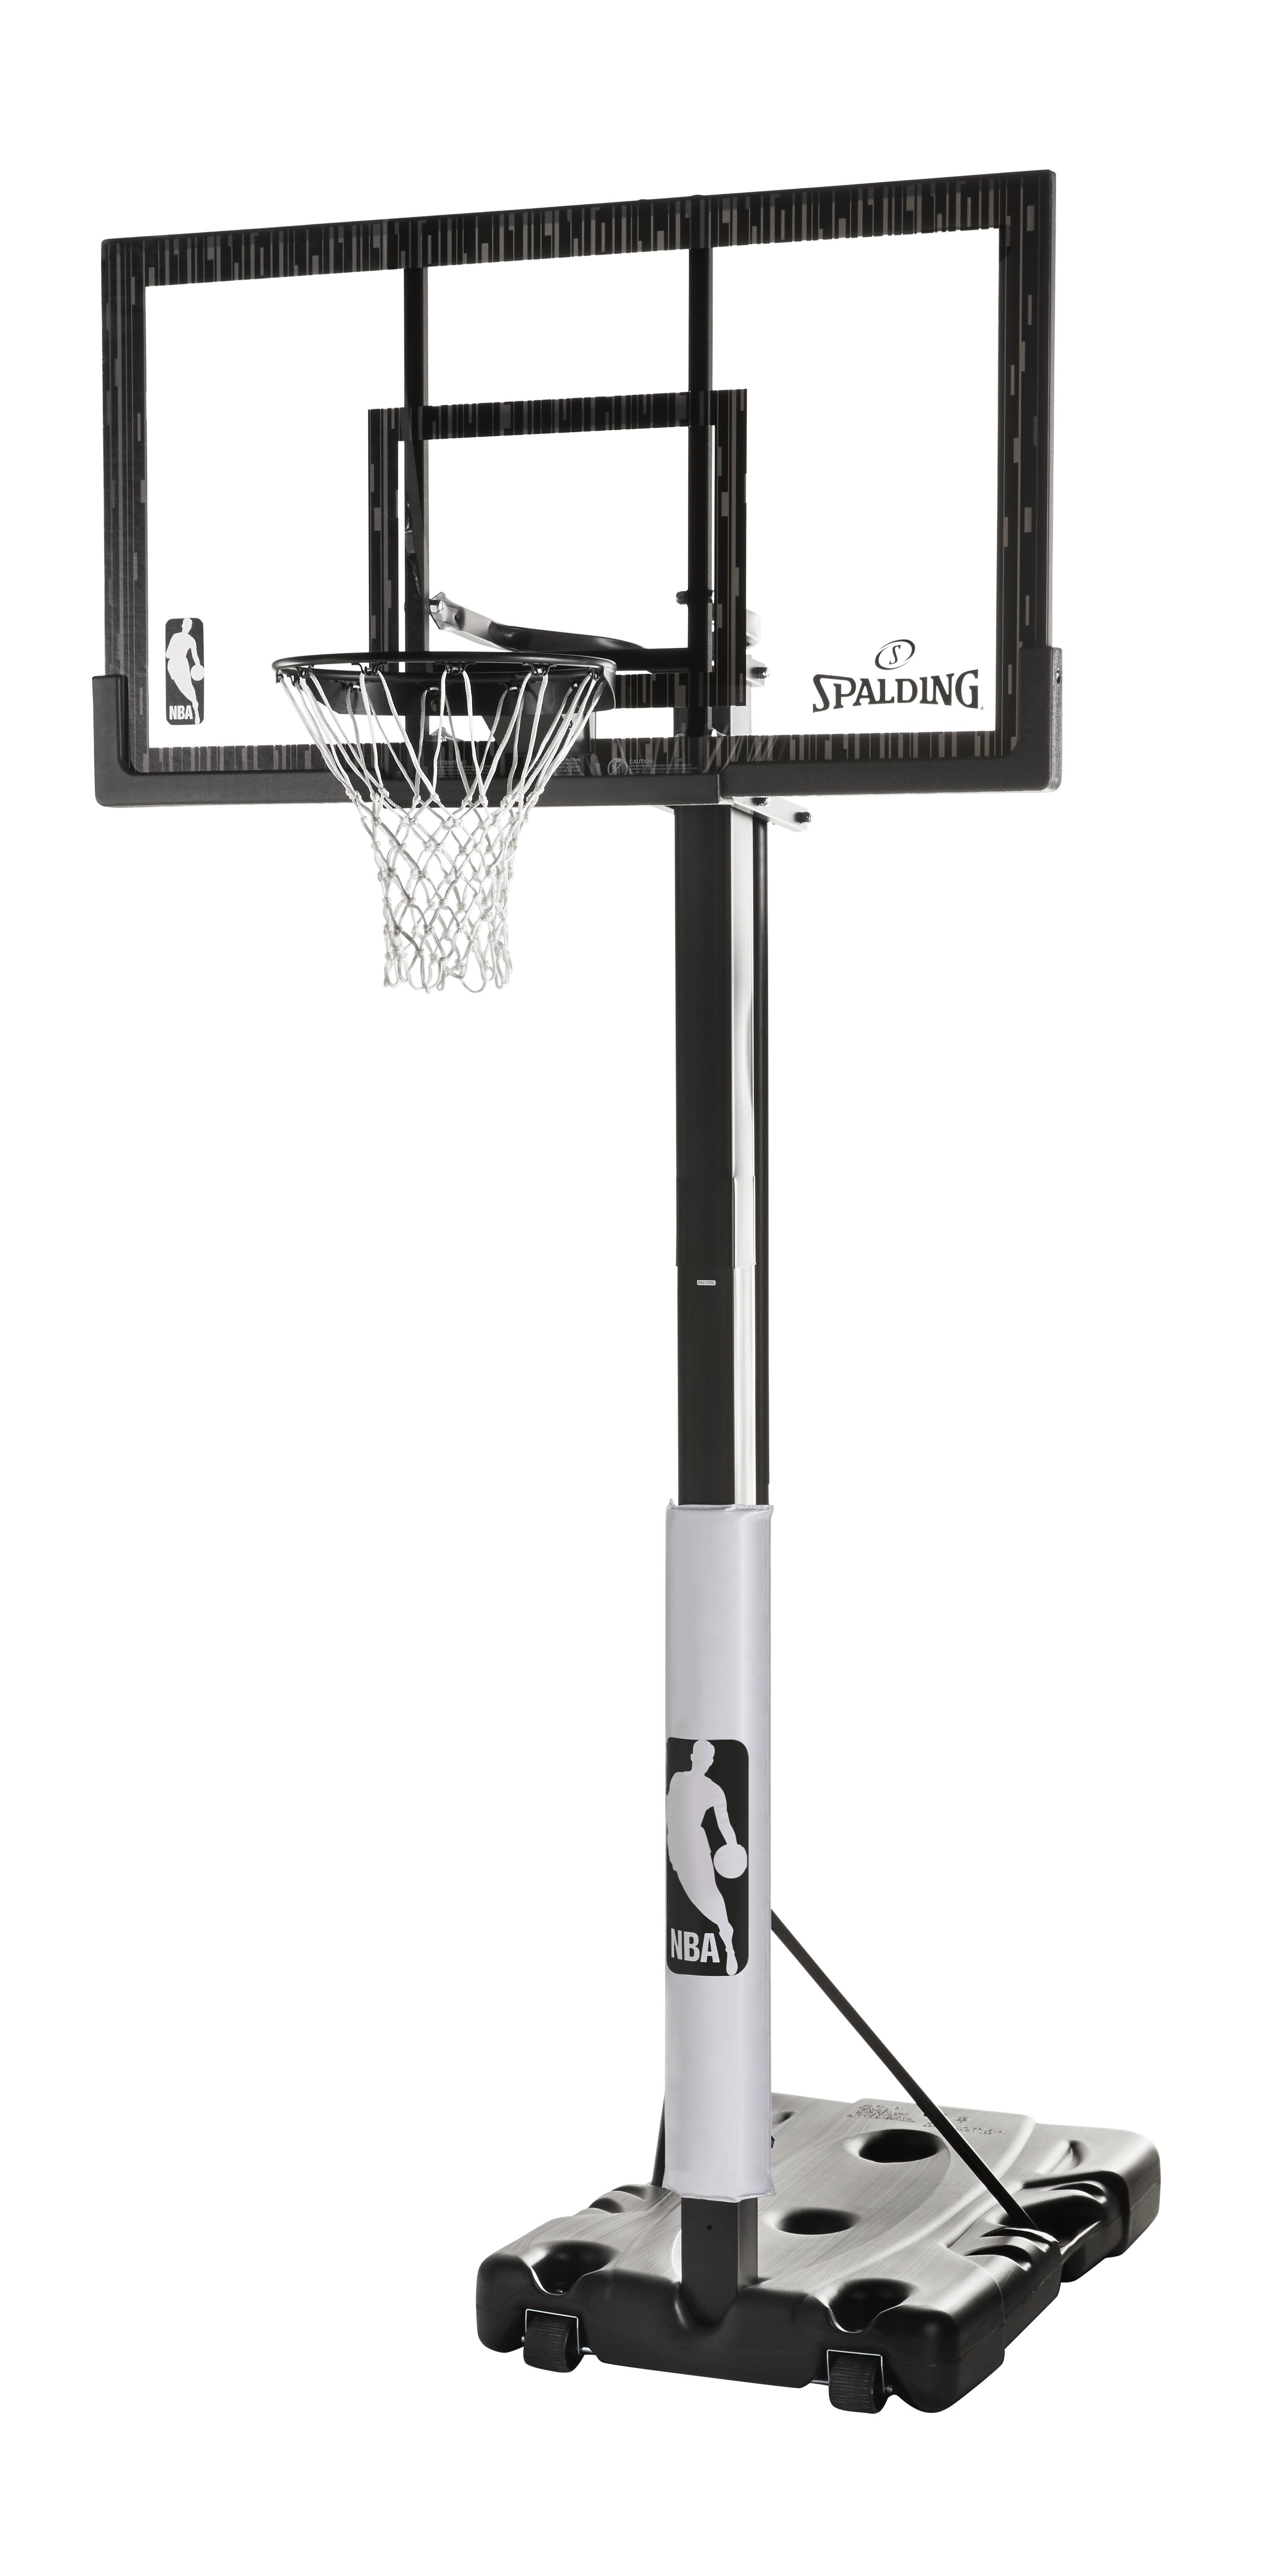 "Spalding NBA 60"" Acrylic Screw Jack Portable Hoop System by Spalding"